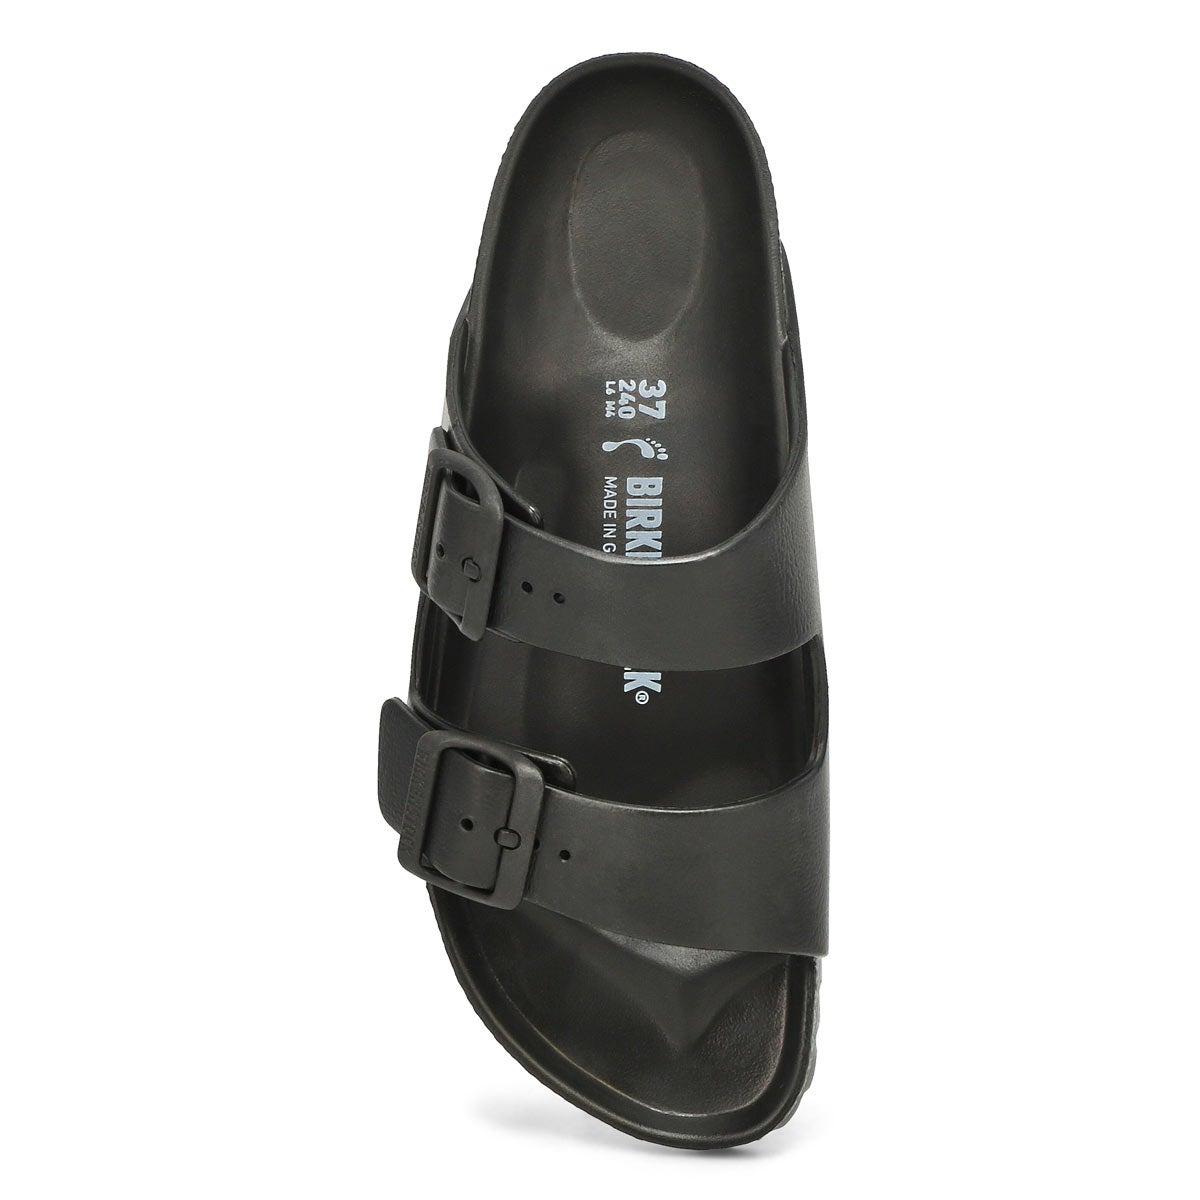 Sandale ARIZONA EVA, noir, fem - Étroit